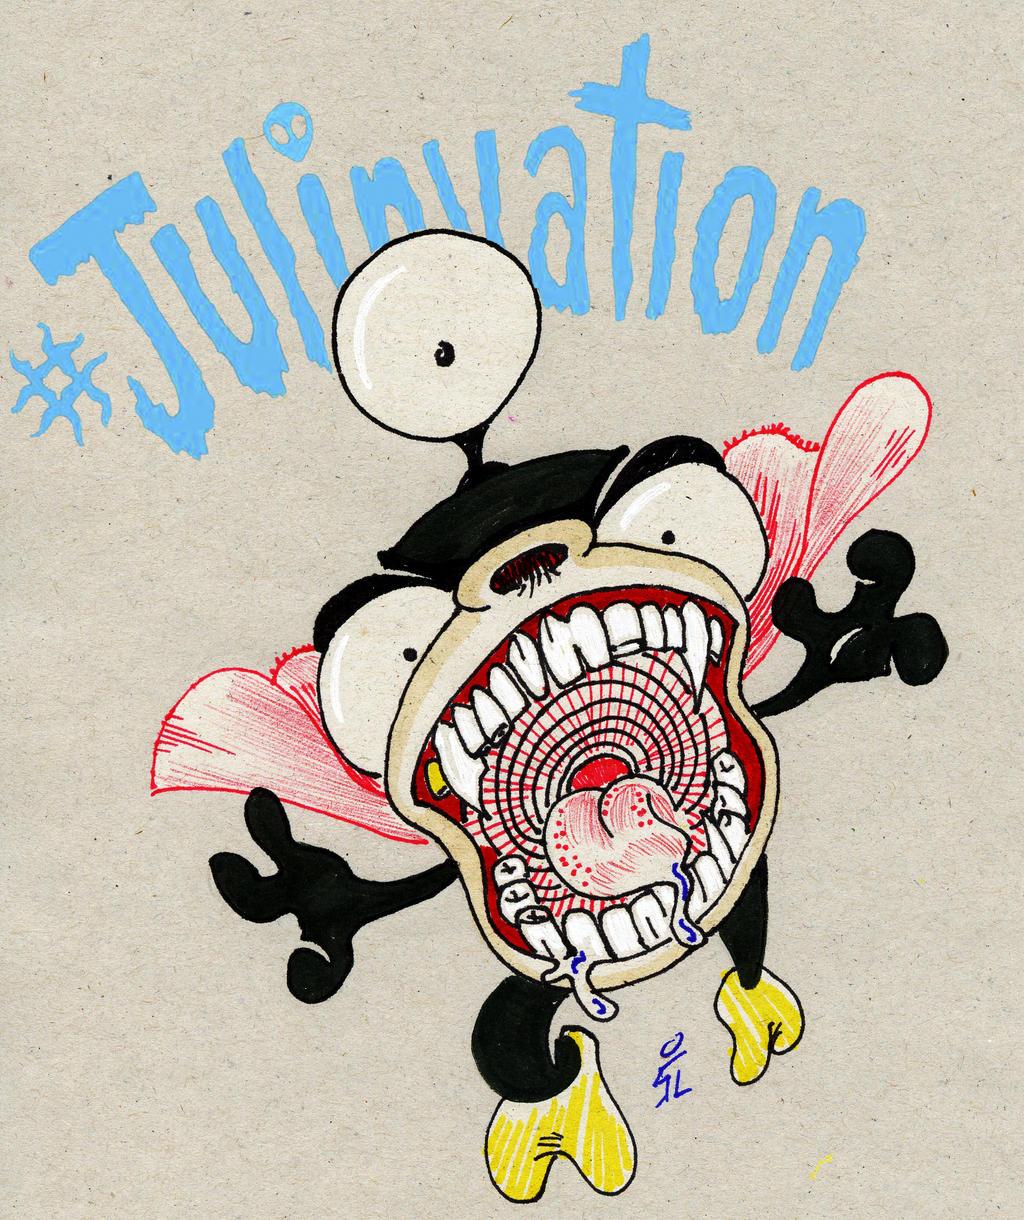 Julinvation8Futurama by mrpulp-presenta